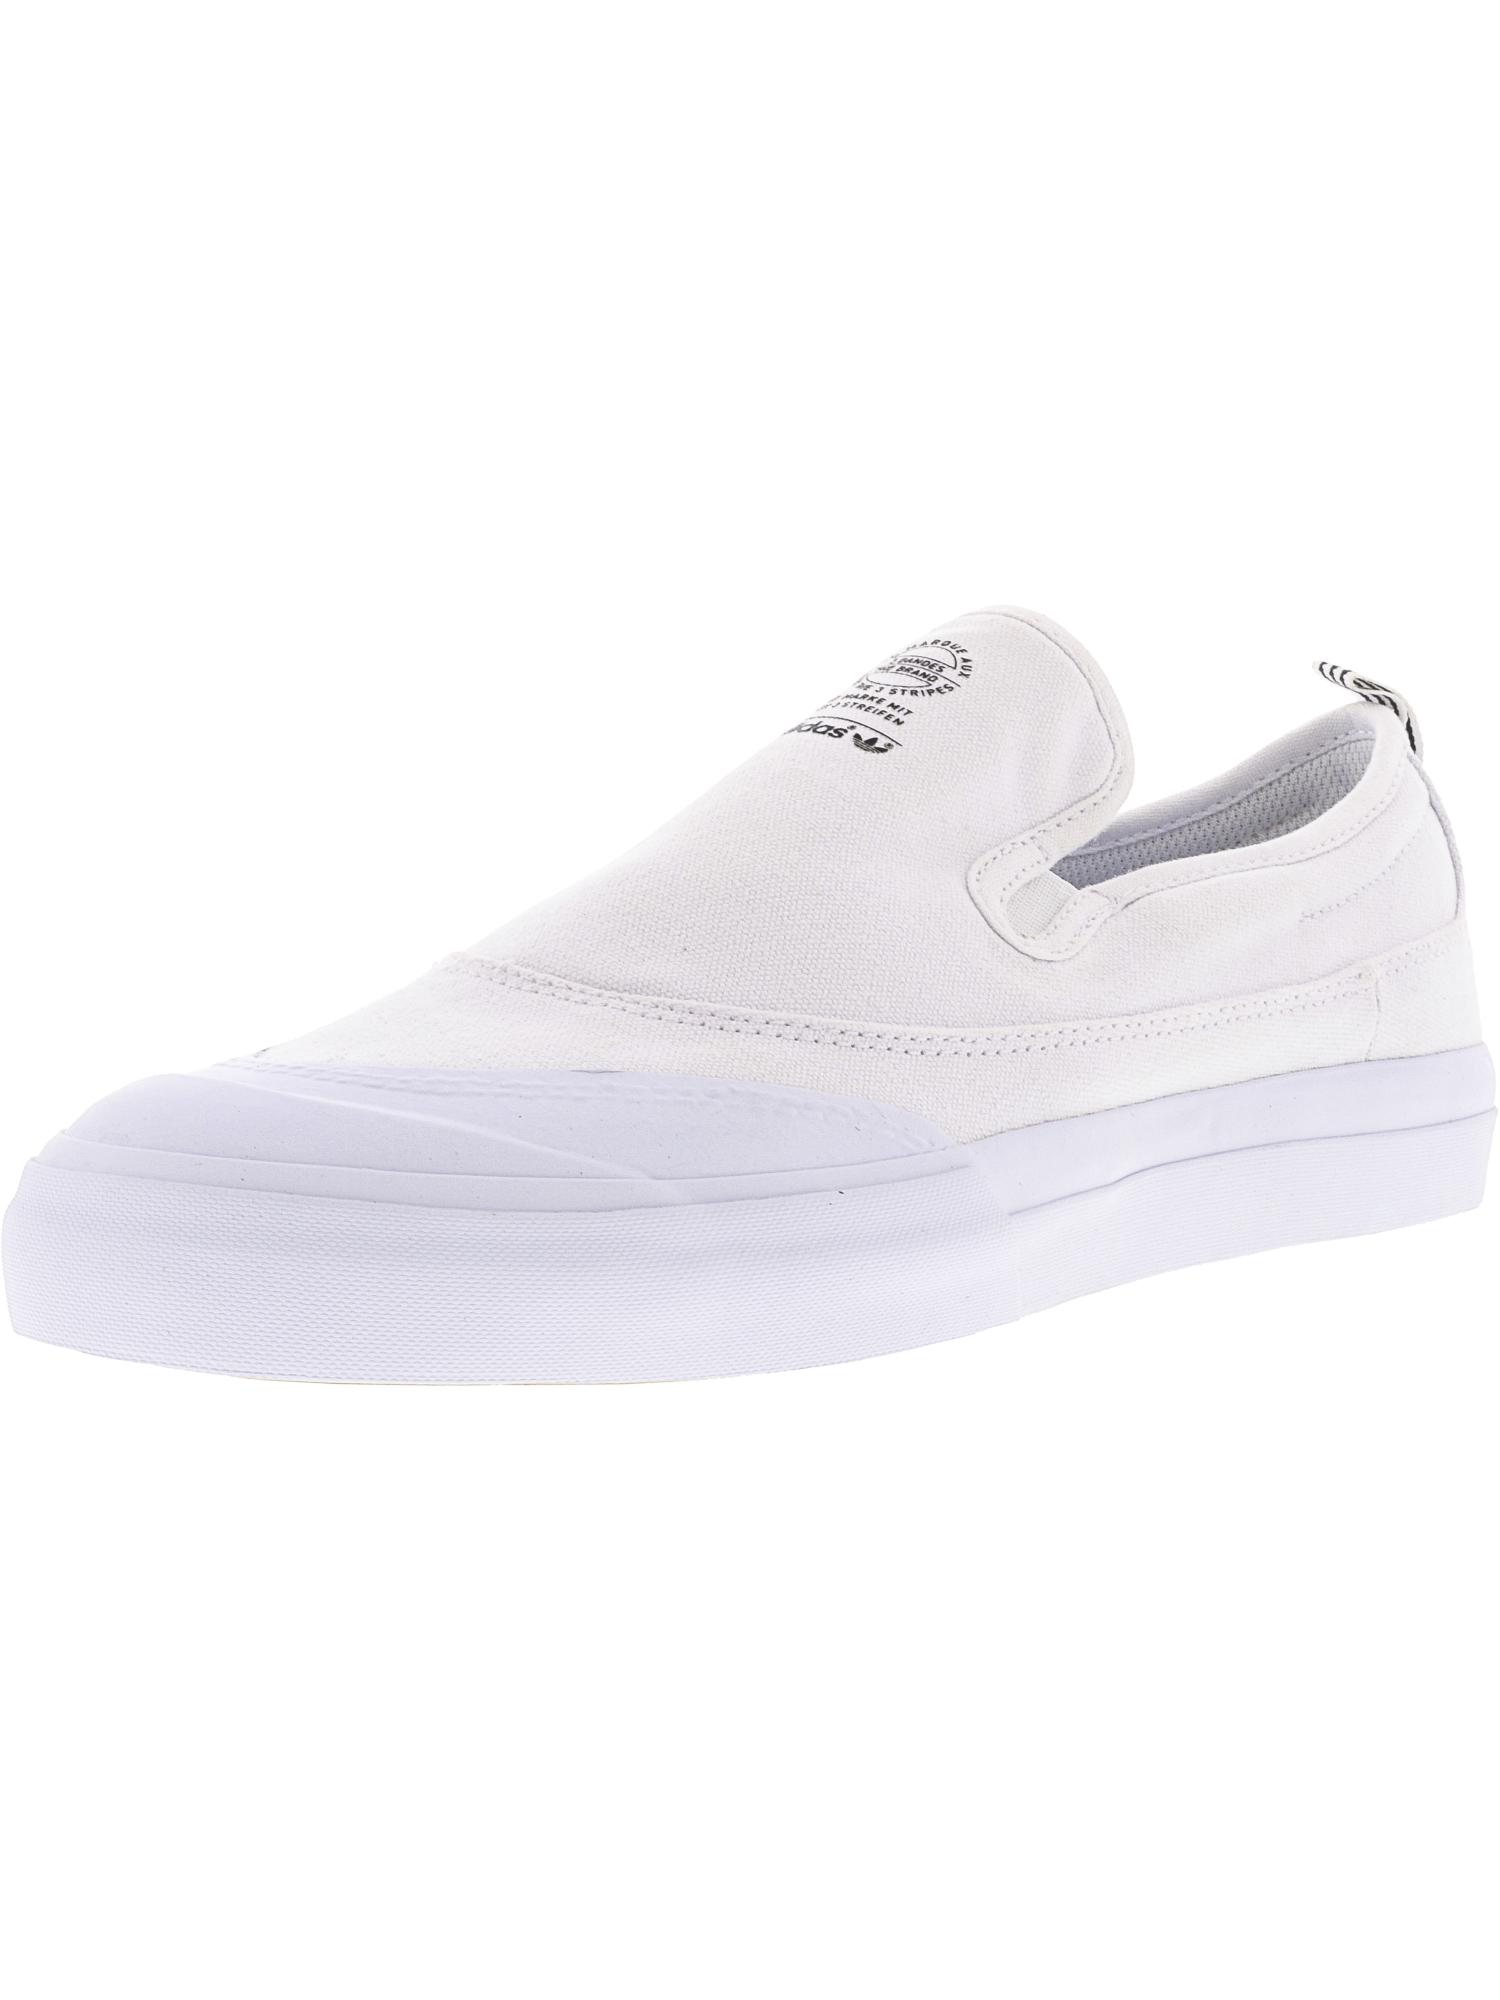 Adidas Men's Matchcourt Slip Ankle-High Canvas Skateboarding Shoe